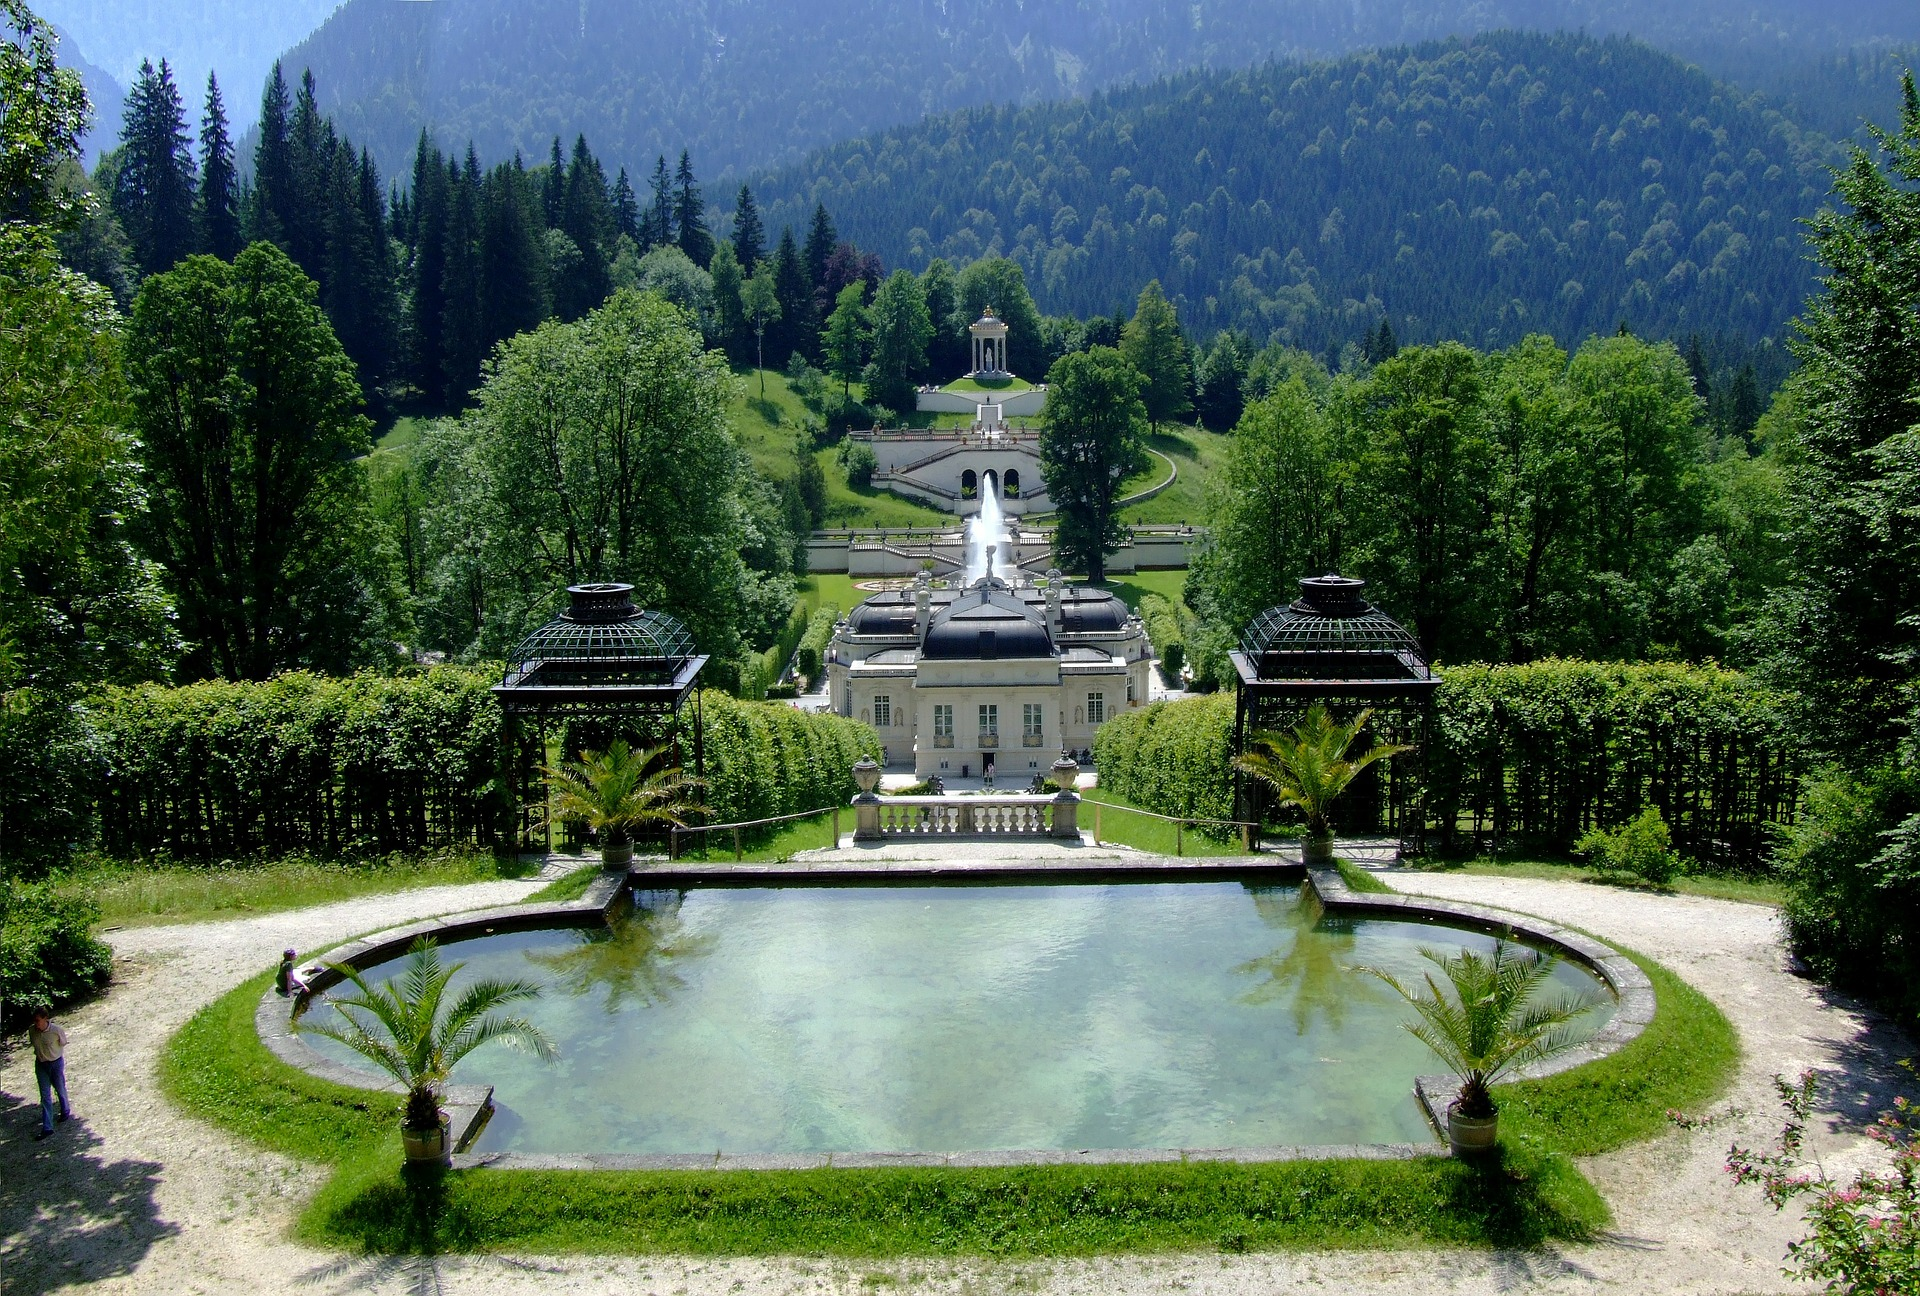 landscape linderhof-palace-266039_1920 (2).jpg